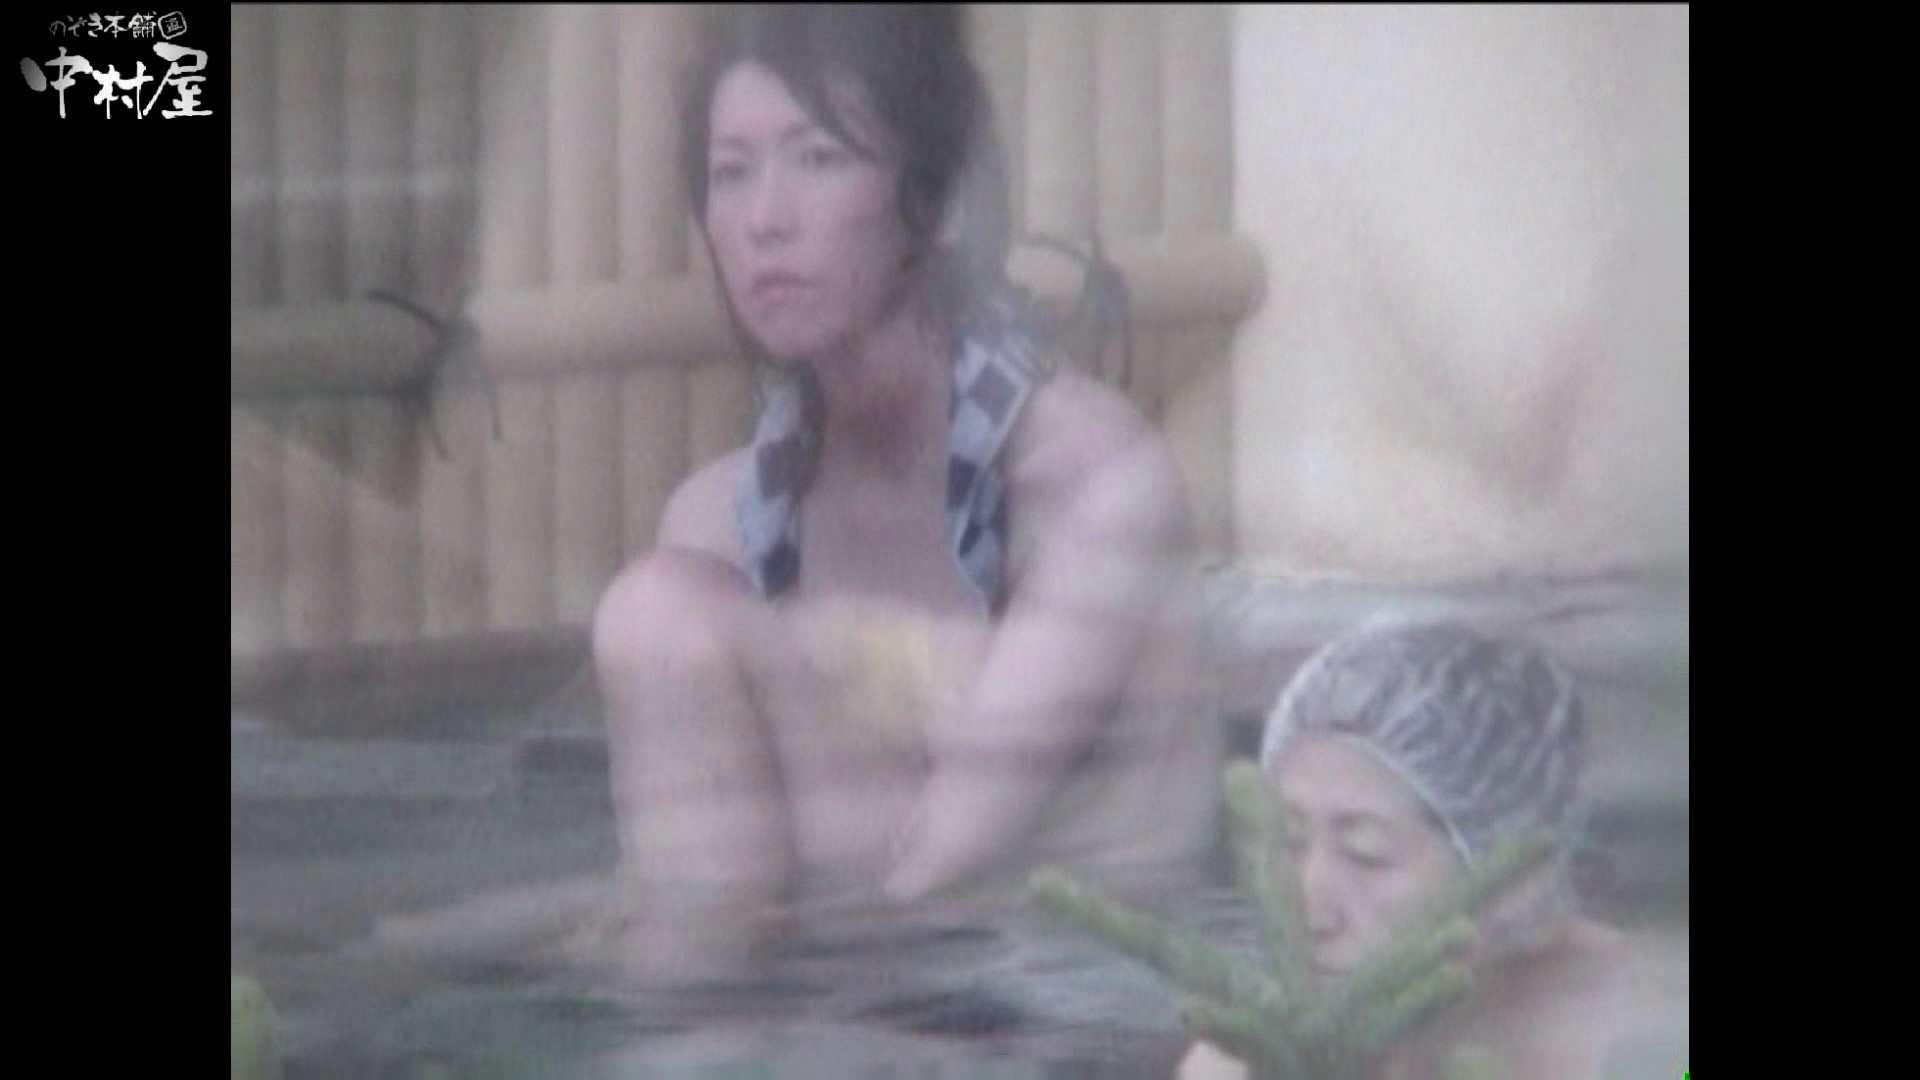 Aquaな露天風呂Vol.987 露天 オマンコ無修正動画無料 71画像 35